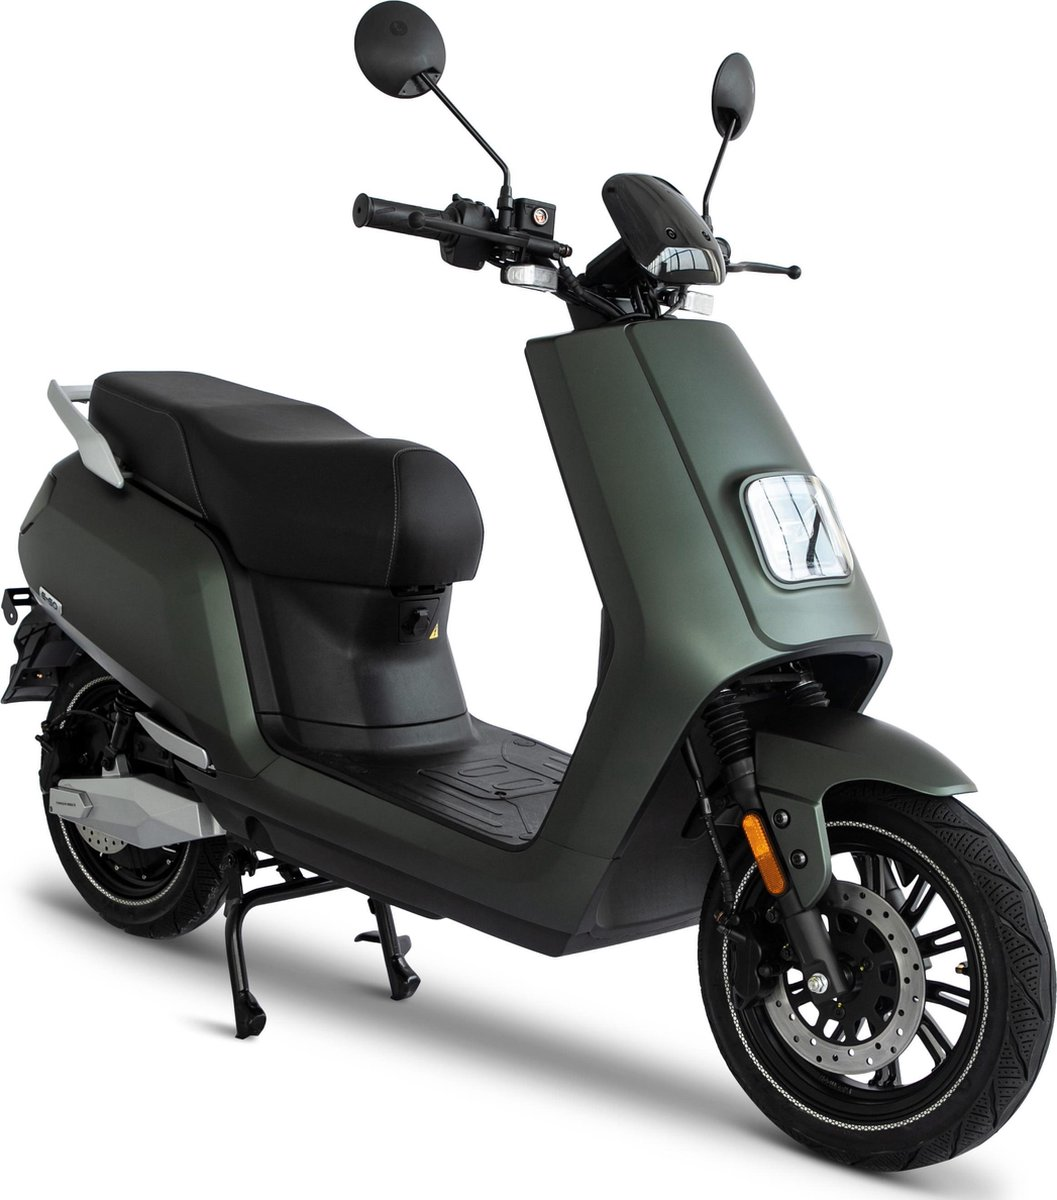 IVA E-GO S5 Elektrische Scooter Matgroen